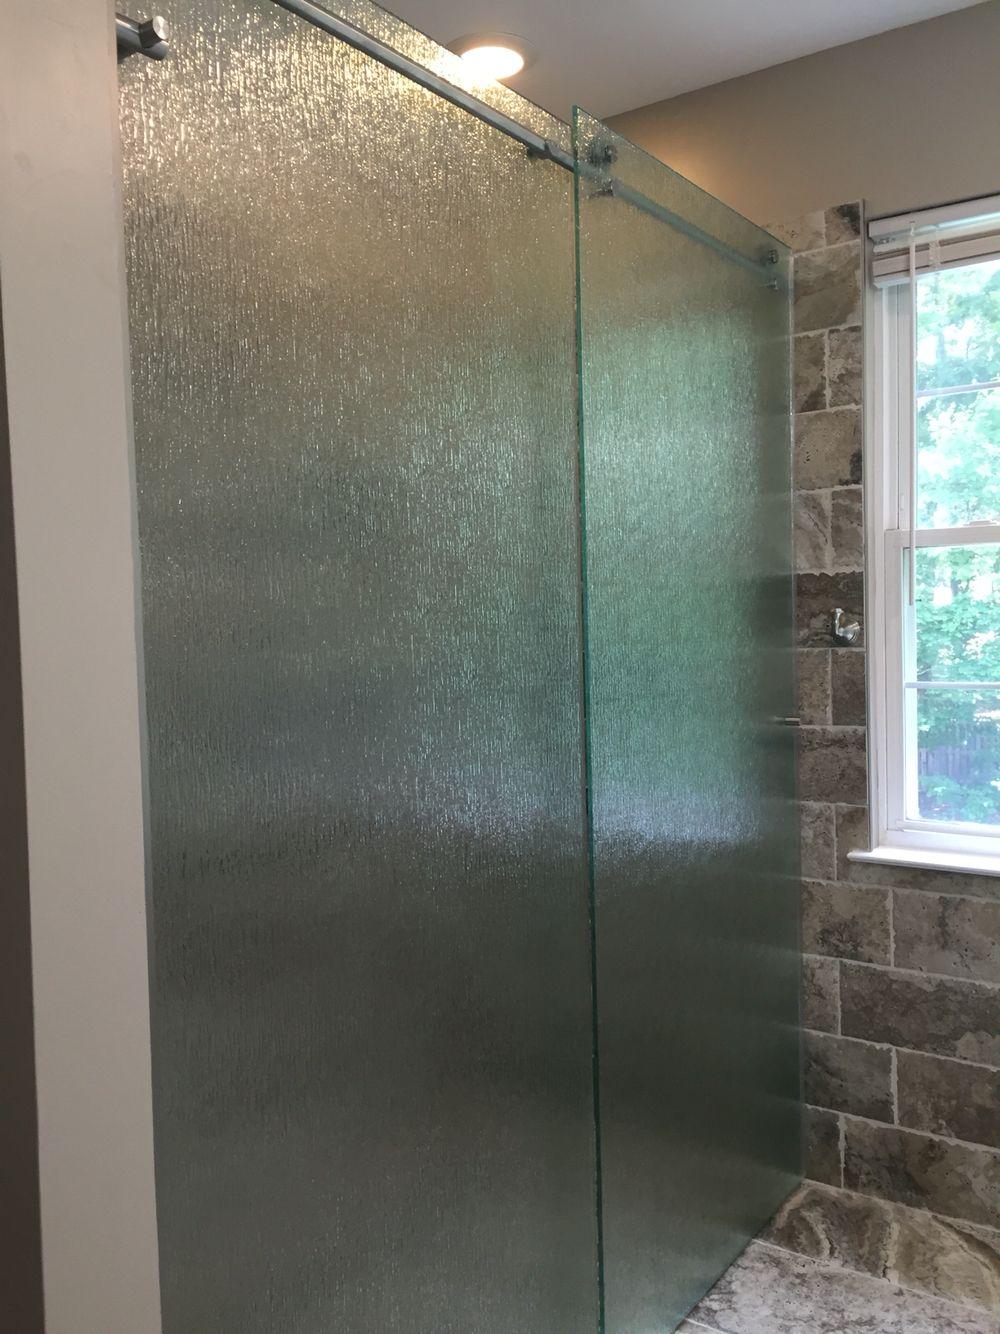 Glass shower door with barrier free access & Glass shower door with barrier free access | Interiors | Pinterest ...